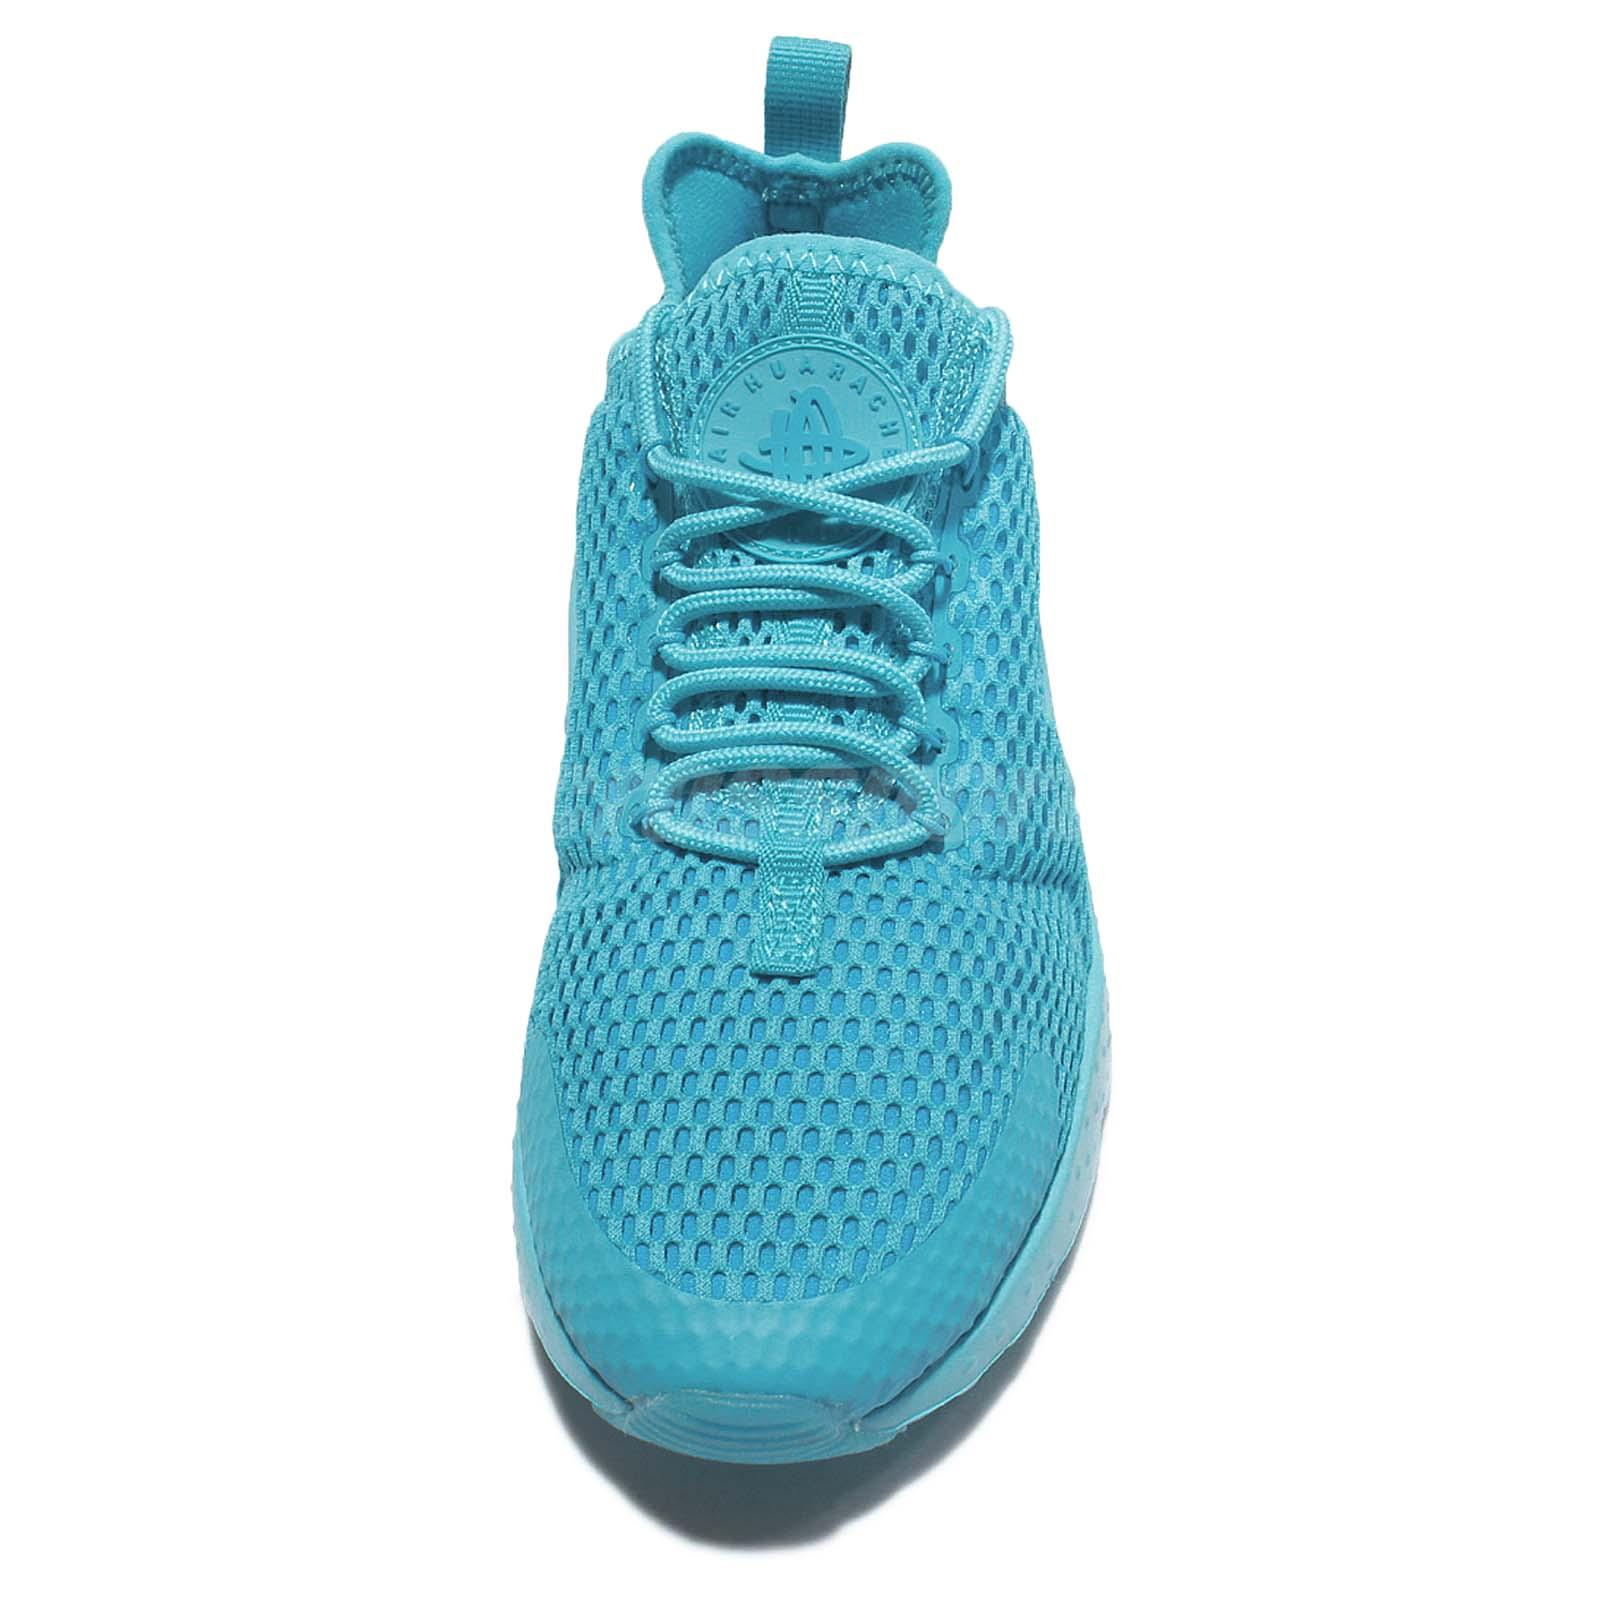 Nike Huarache Aire Dirigido De Ultra Br Una Venda ooqmBBieJ